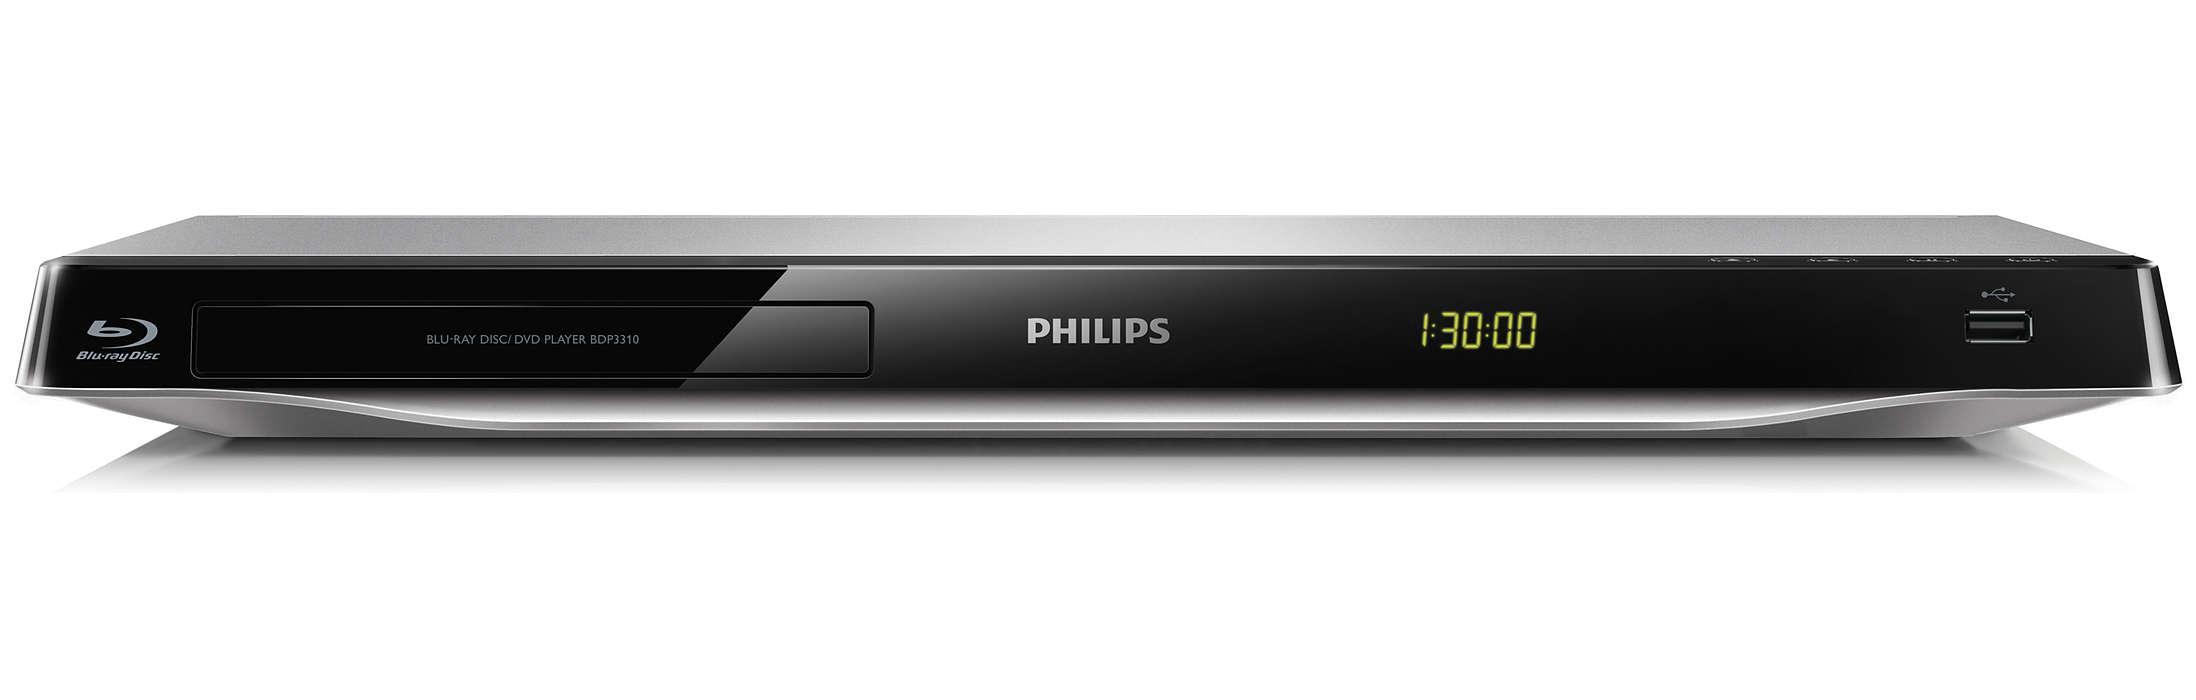 Få en hjemmekinoopplevelse med Blu-ray